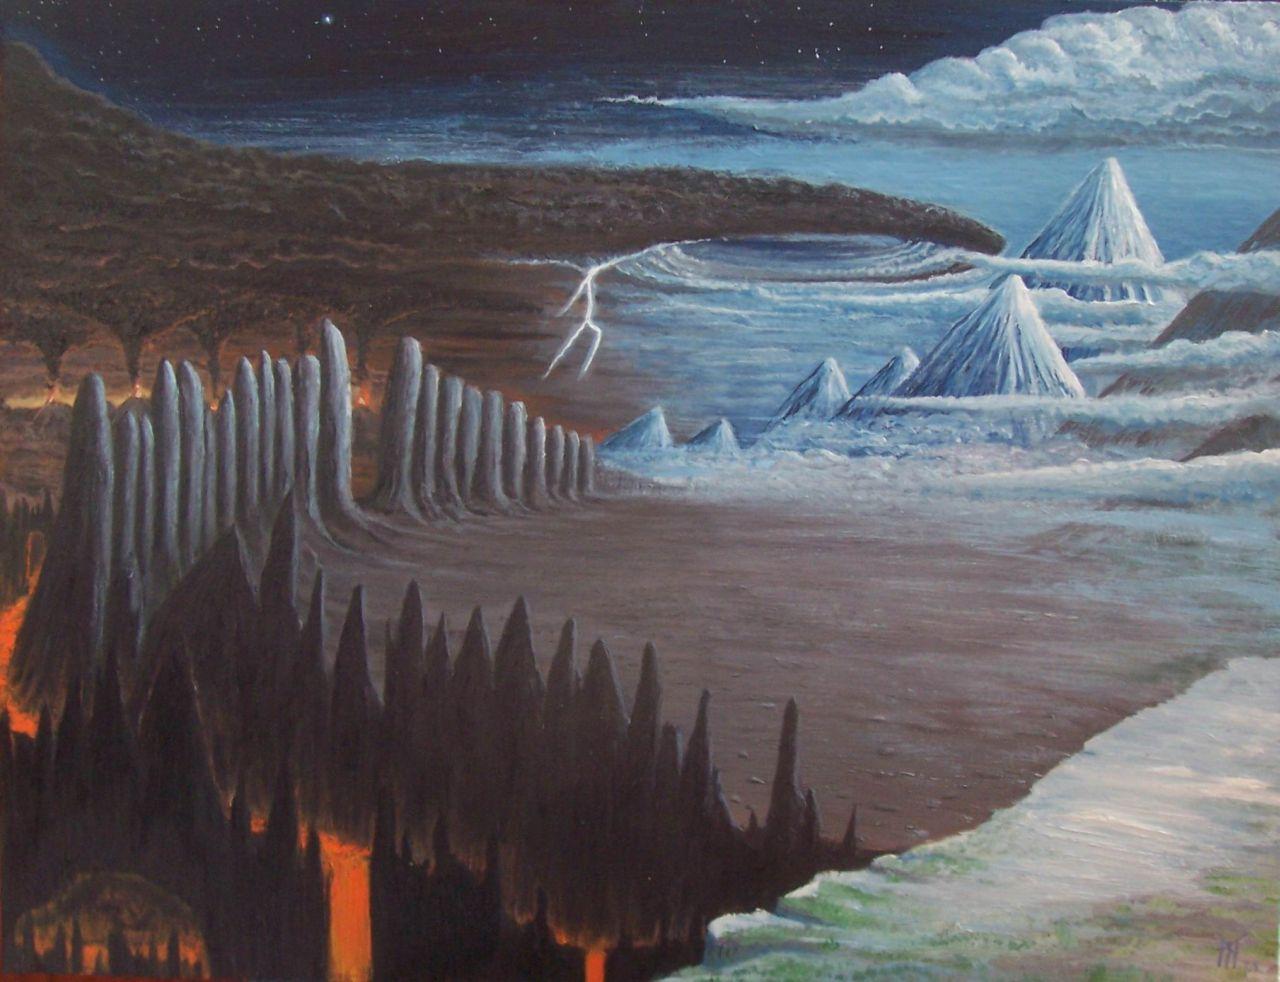 Vígríðr (2008) – tranh của Miroslav Zapletal